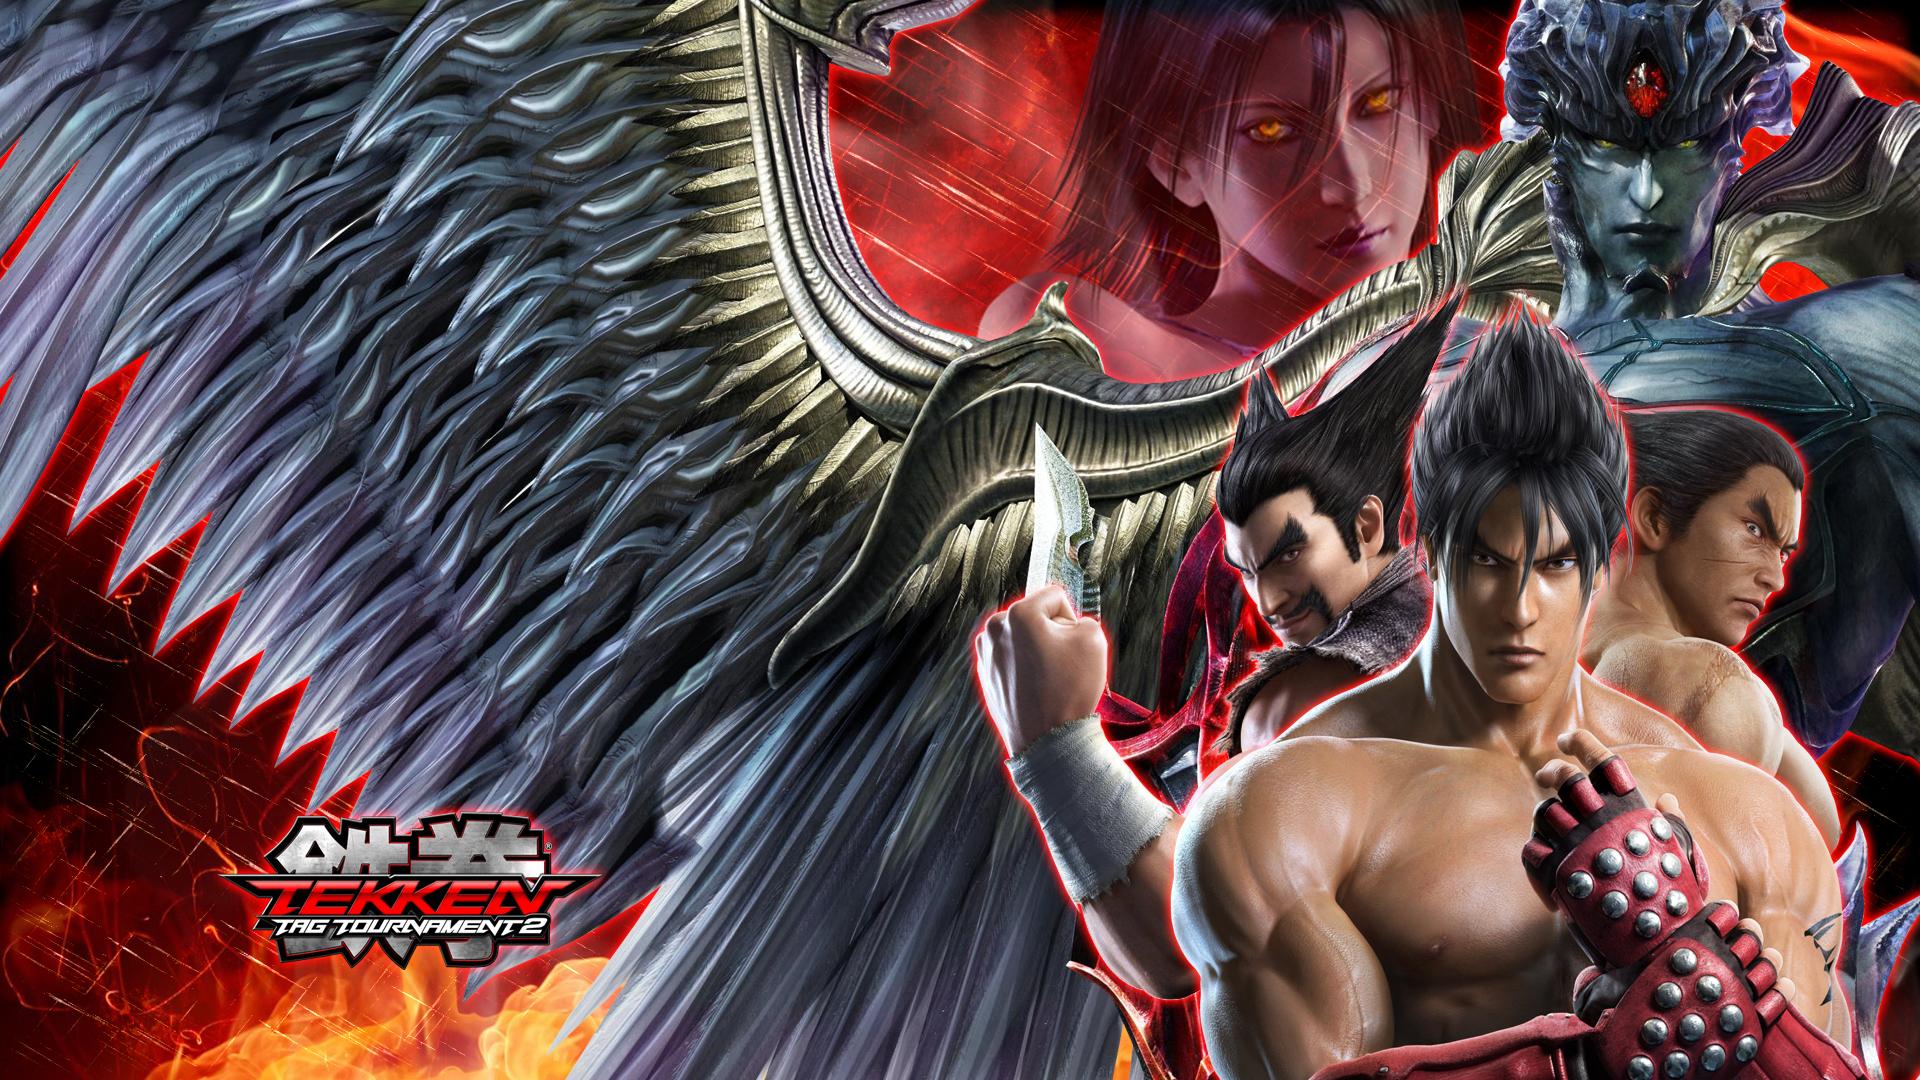 Tekken Tag Tournament 2 Wallpaper Final By Jin 05 On Deviantart